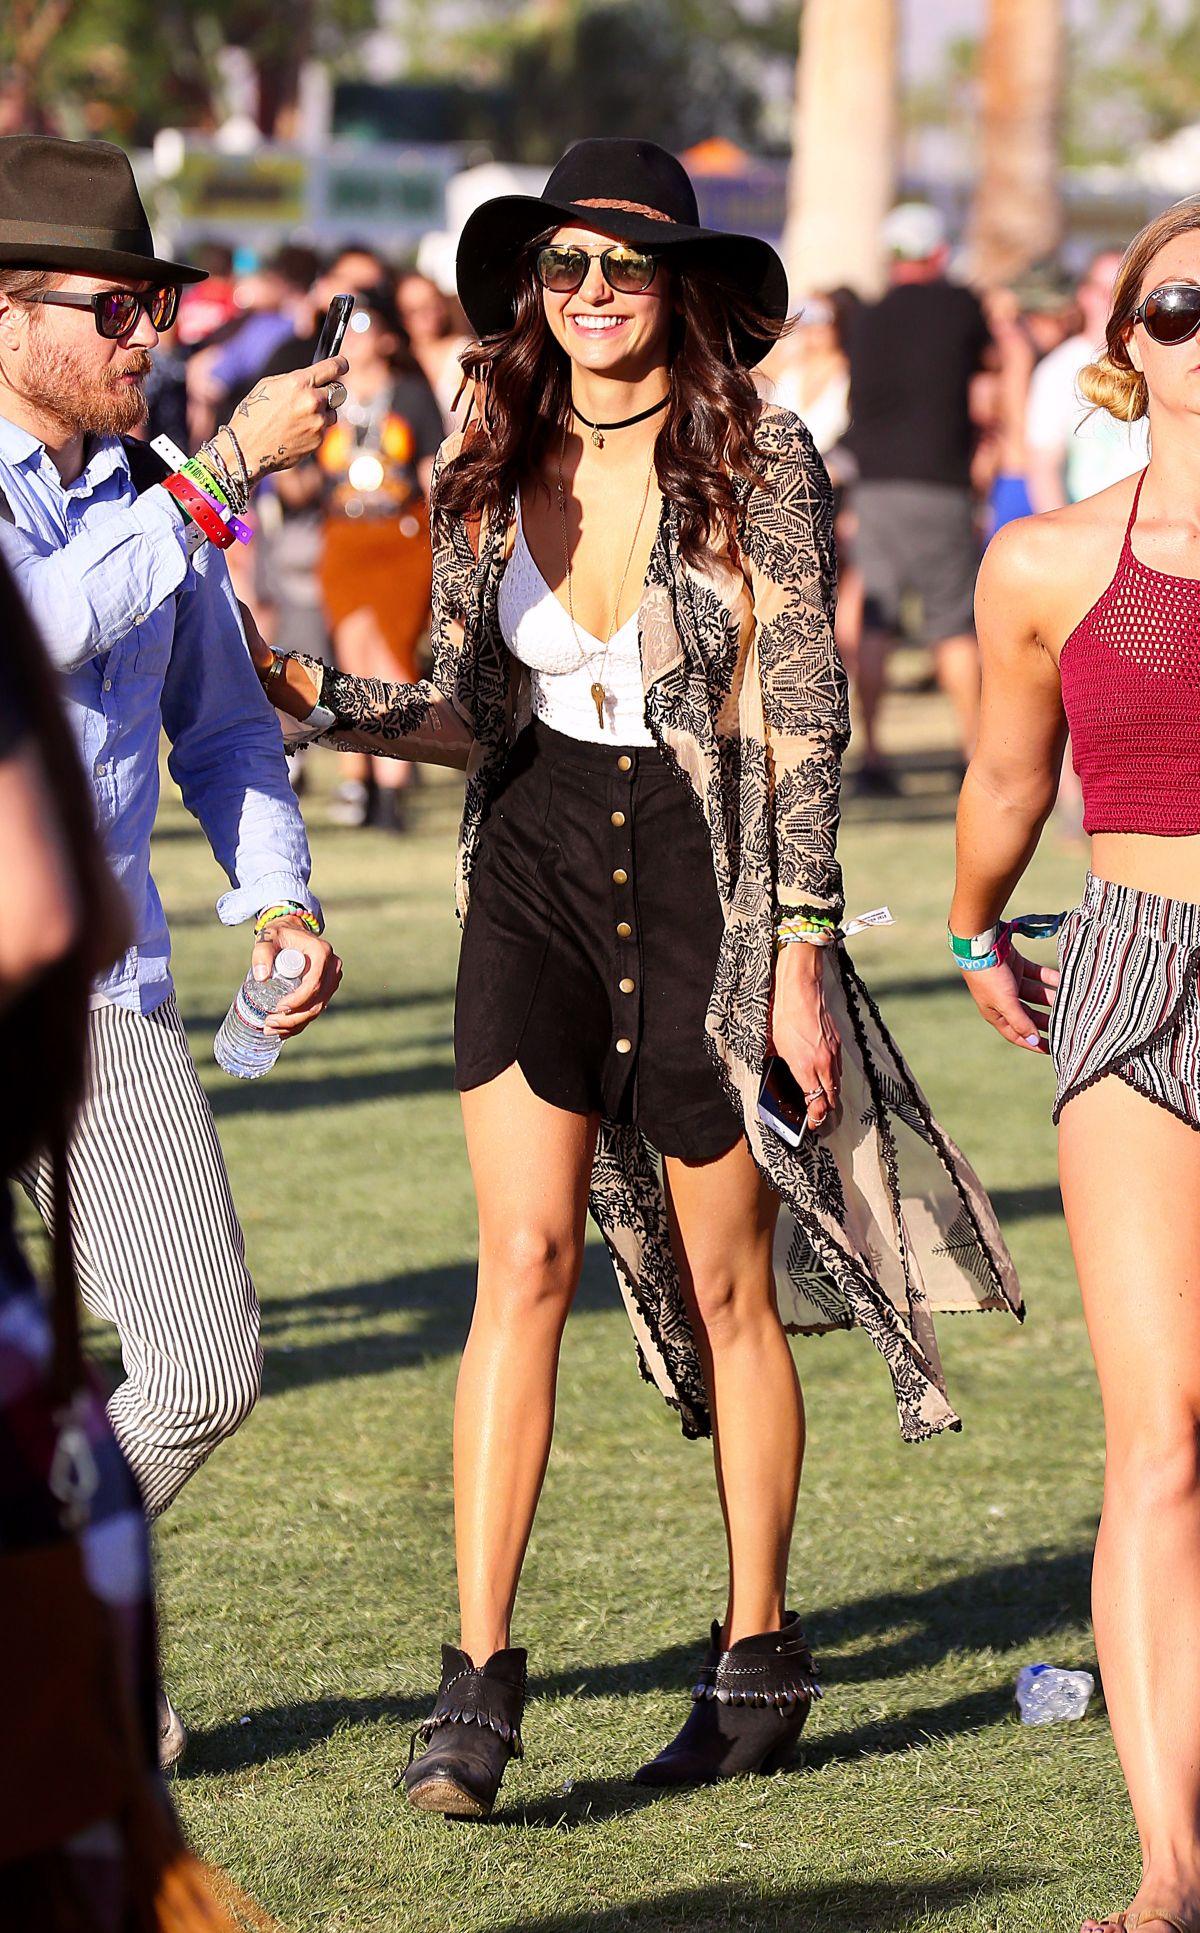 NINA DOBREV at 2016 Coachella Valley Music and Arts Festival in Indio 04/15/2016